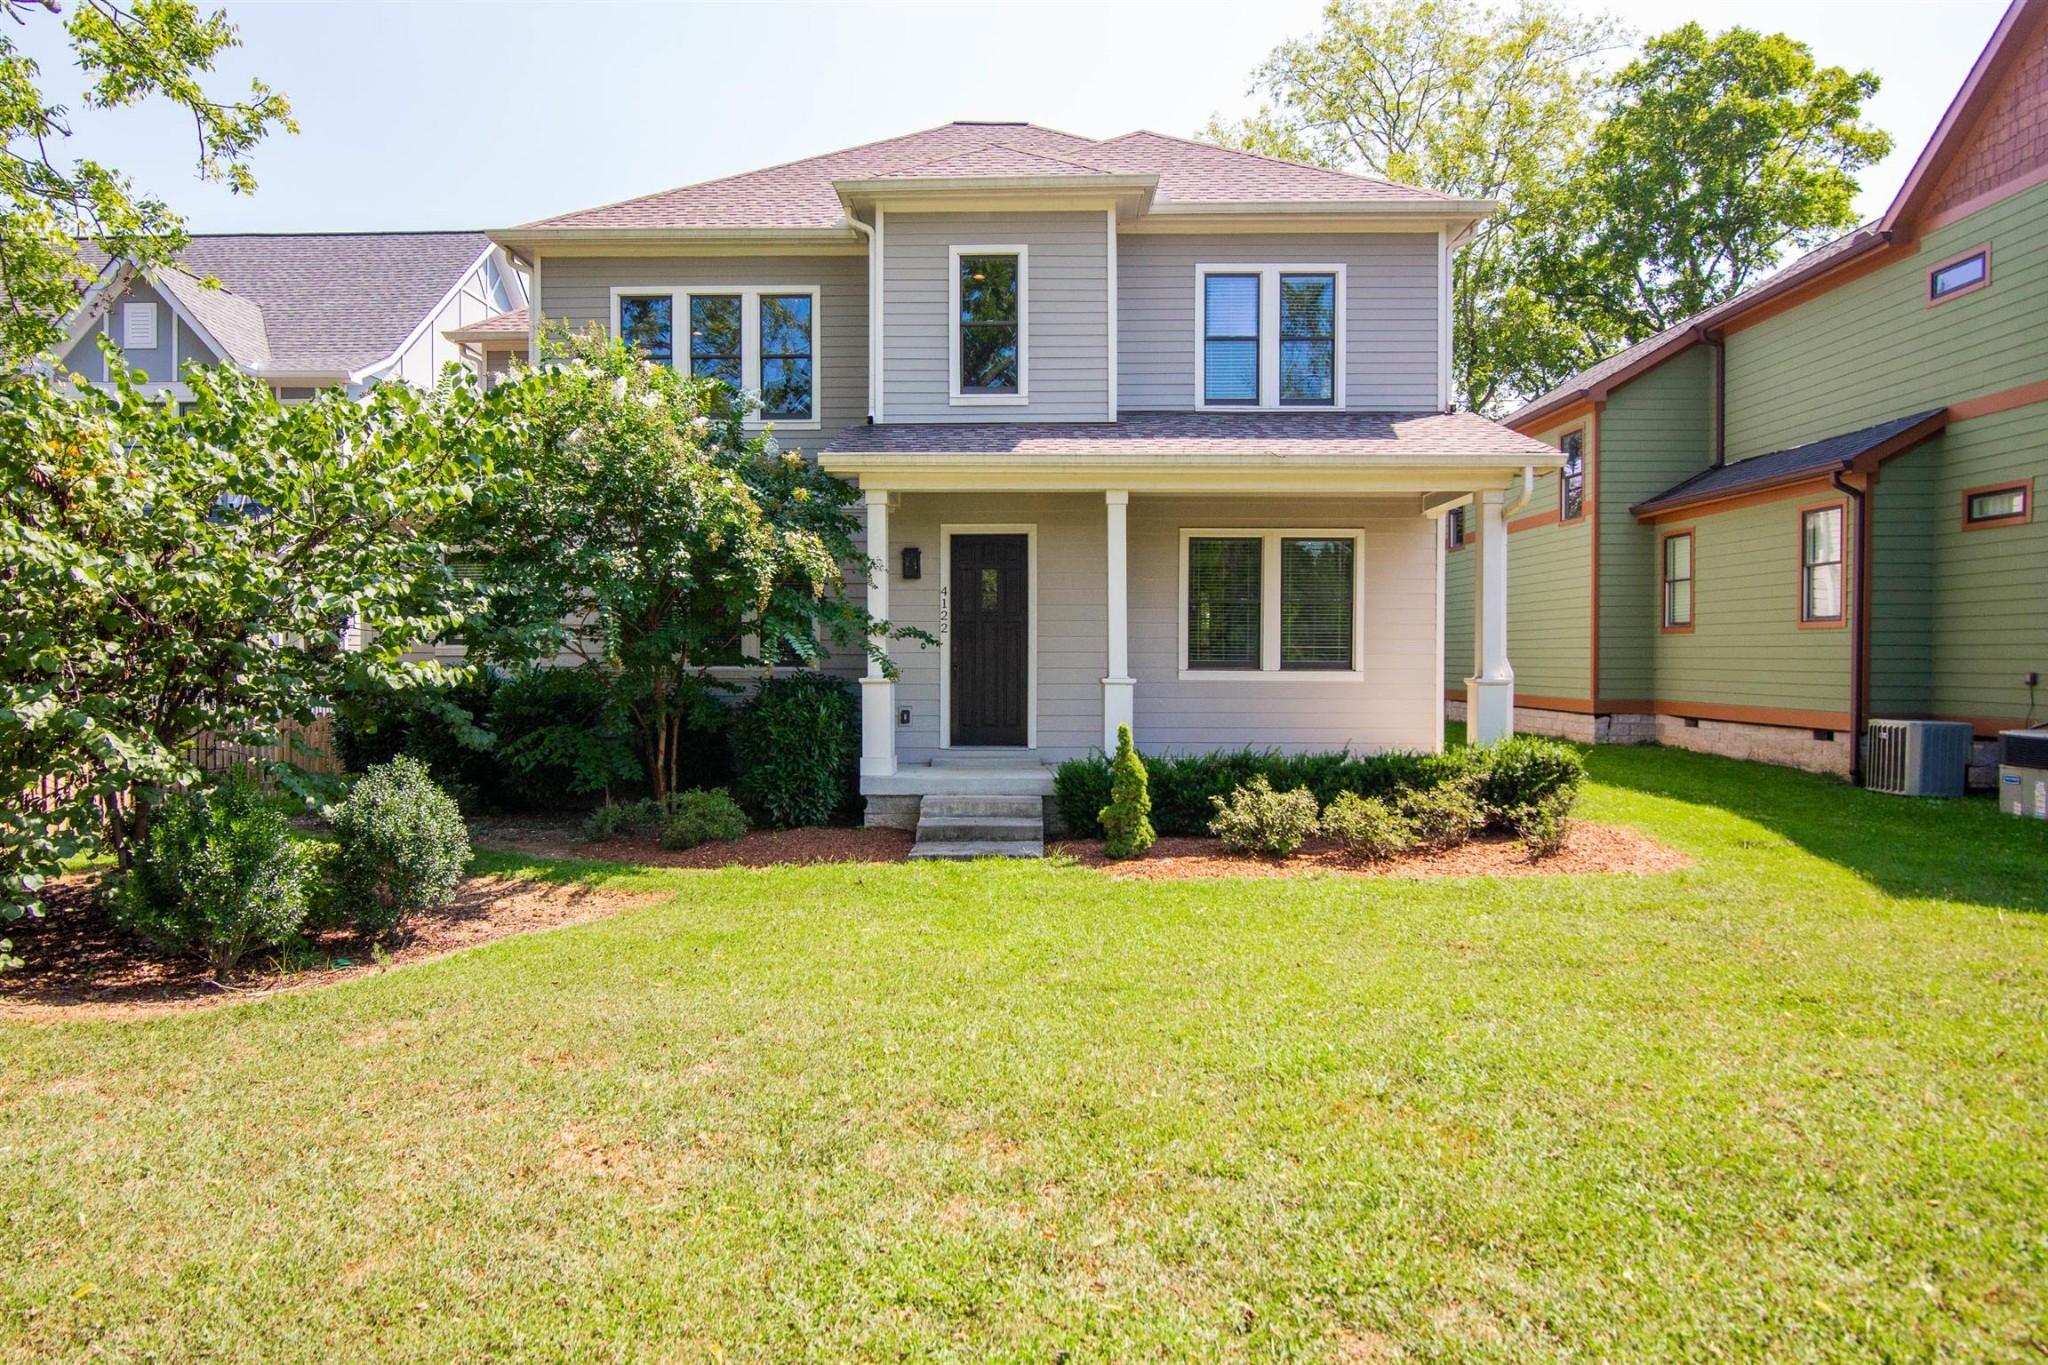 4122 Granny White Pike Property Photo - Nashville, TN real estate listing